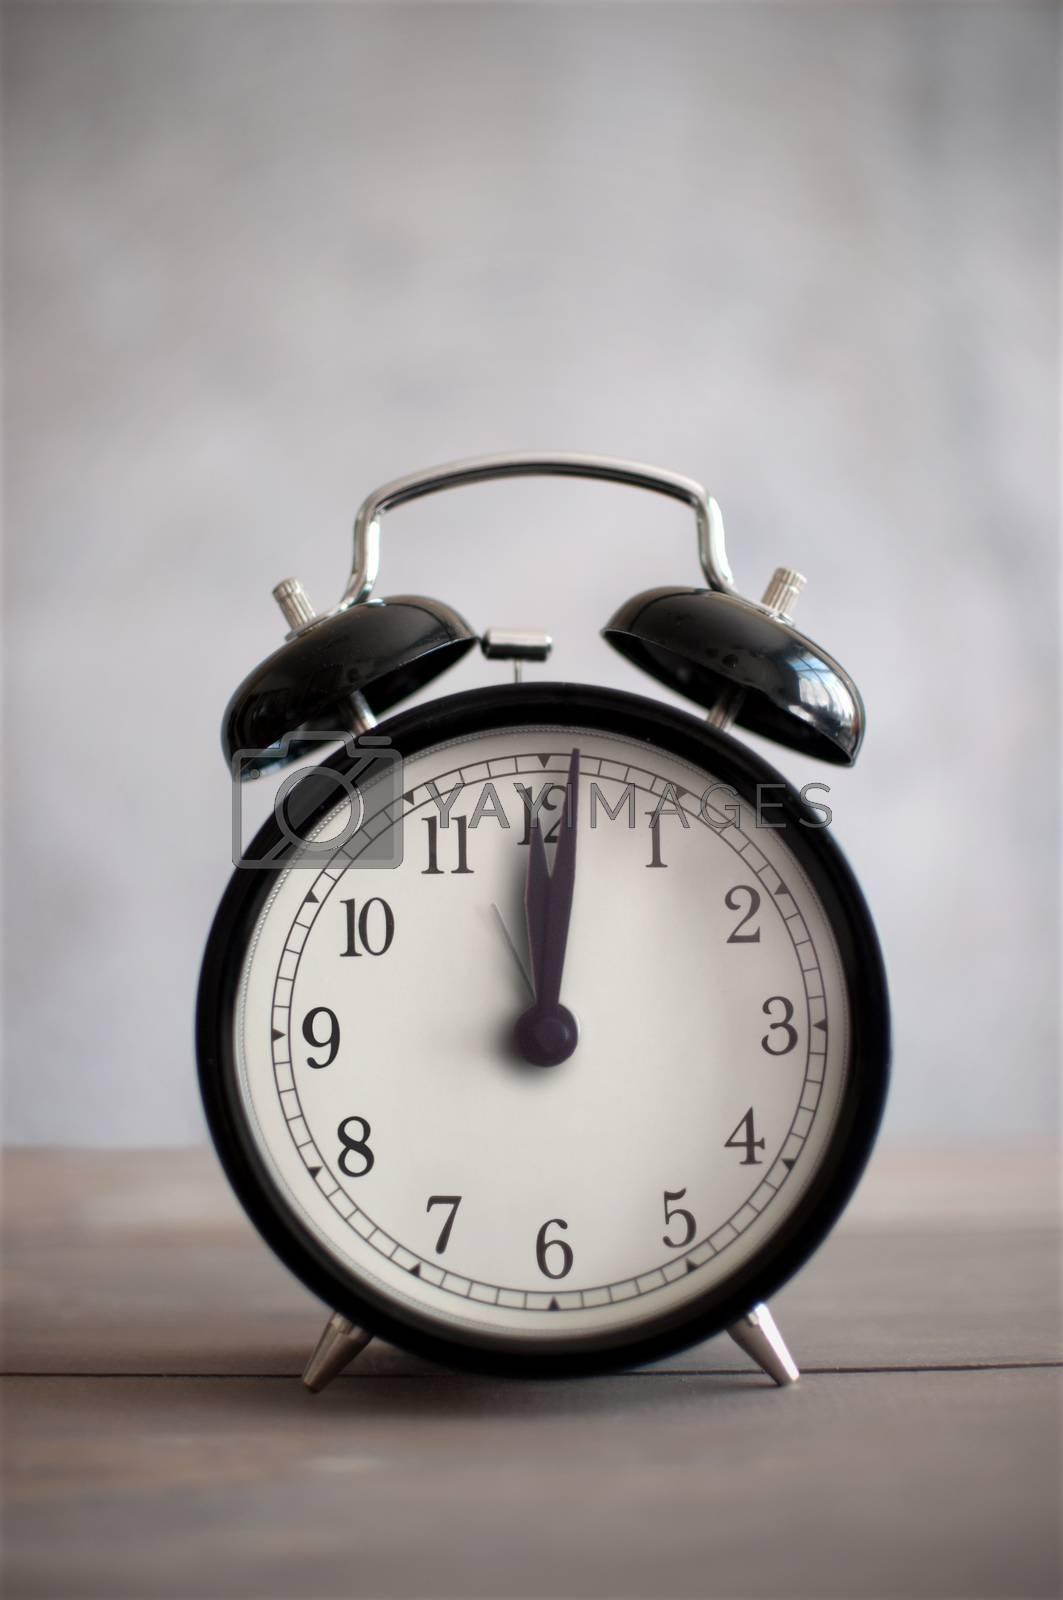 Royalty free image of Vintage alarm clock by unikpix